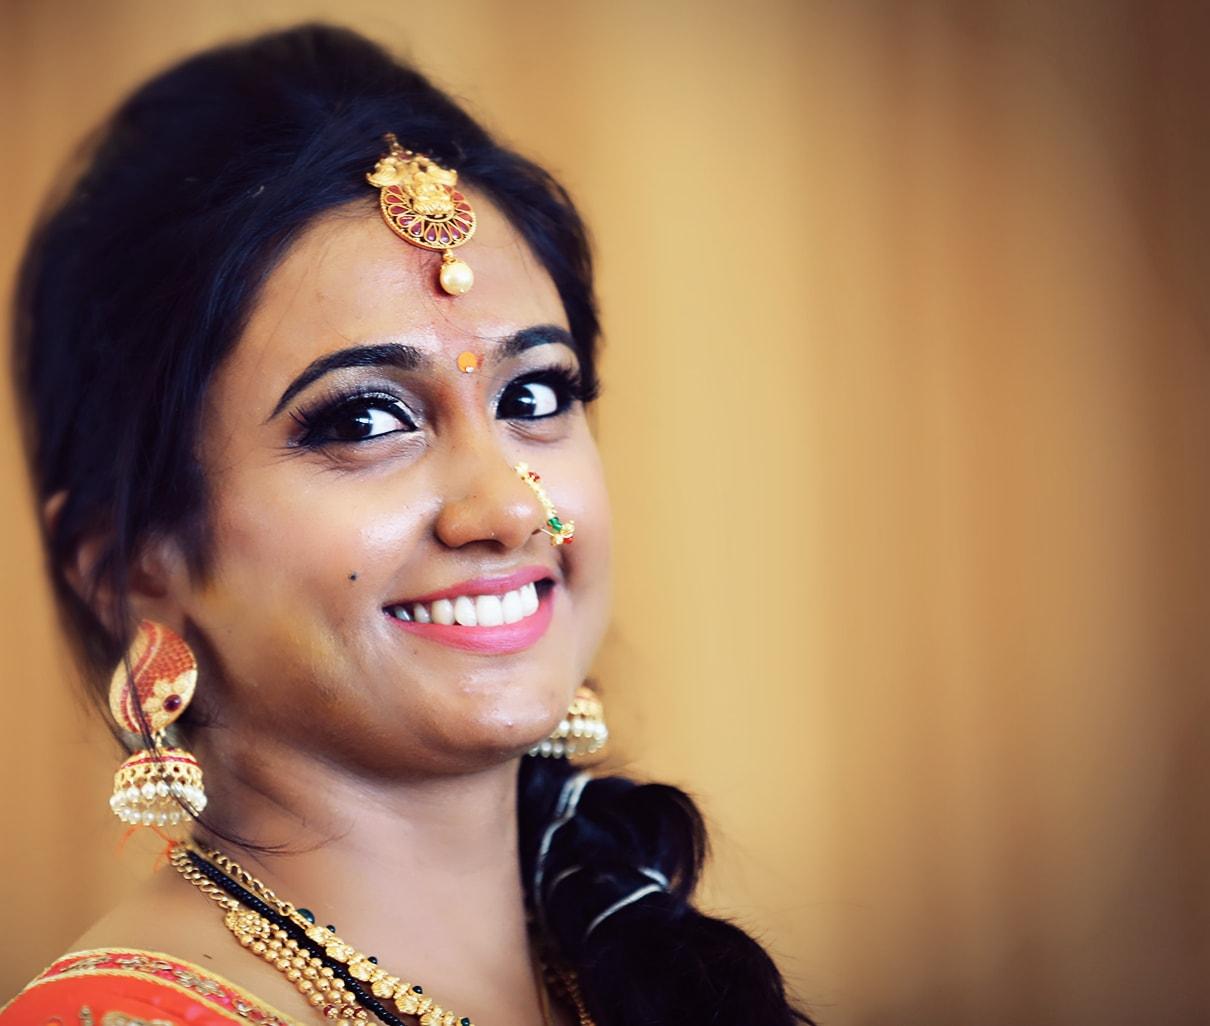 Bride Wearing Pretty Airbrush Makeup by Priyanka Bridal-makeup | Weddings Photos & Ideas